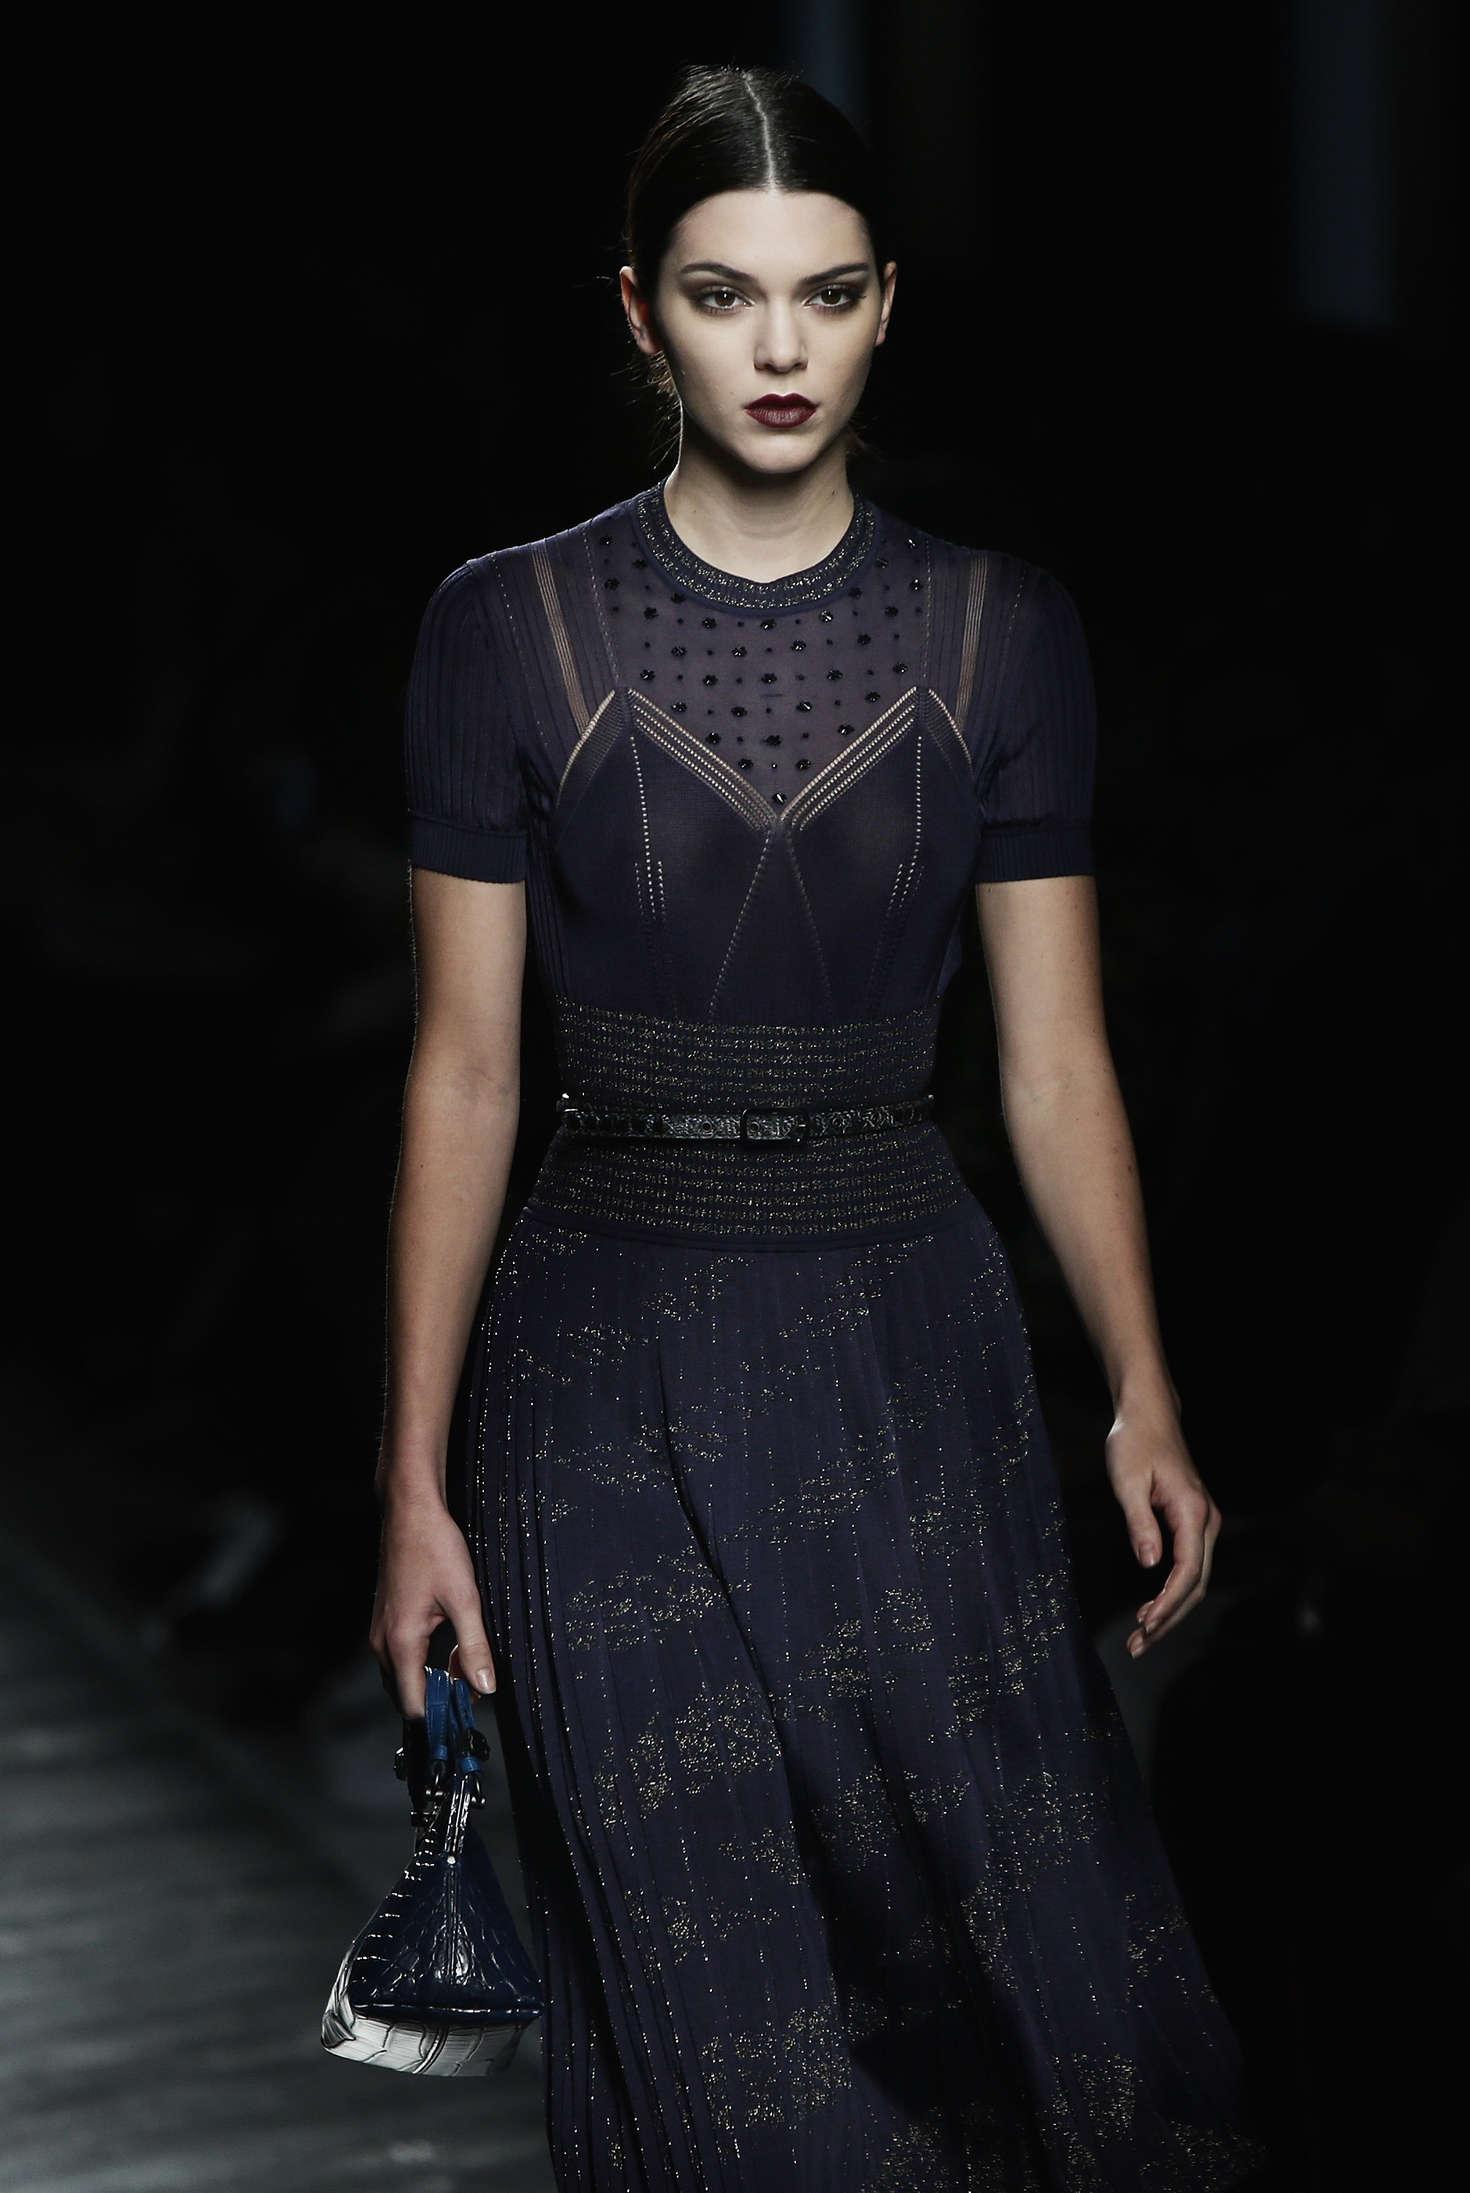 Kendall jenner bottega veneta fashion show 2016 in milan for Milan show 2016